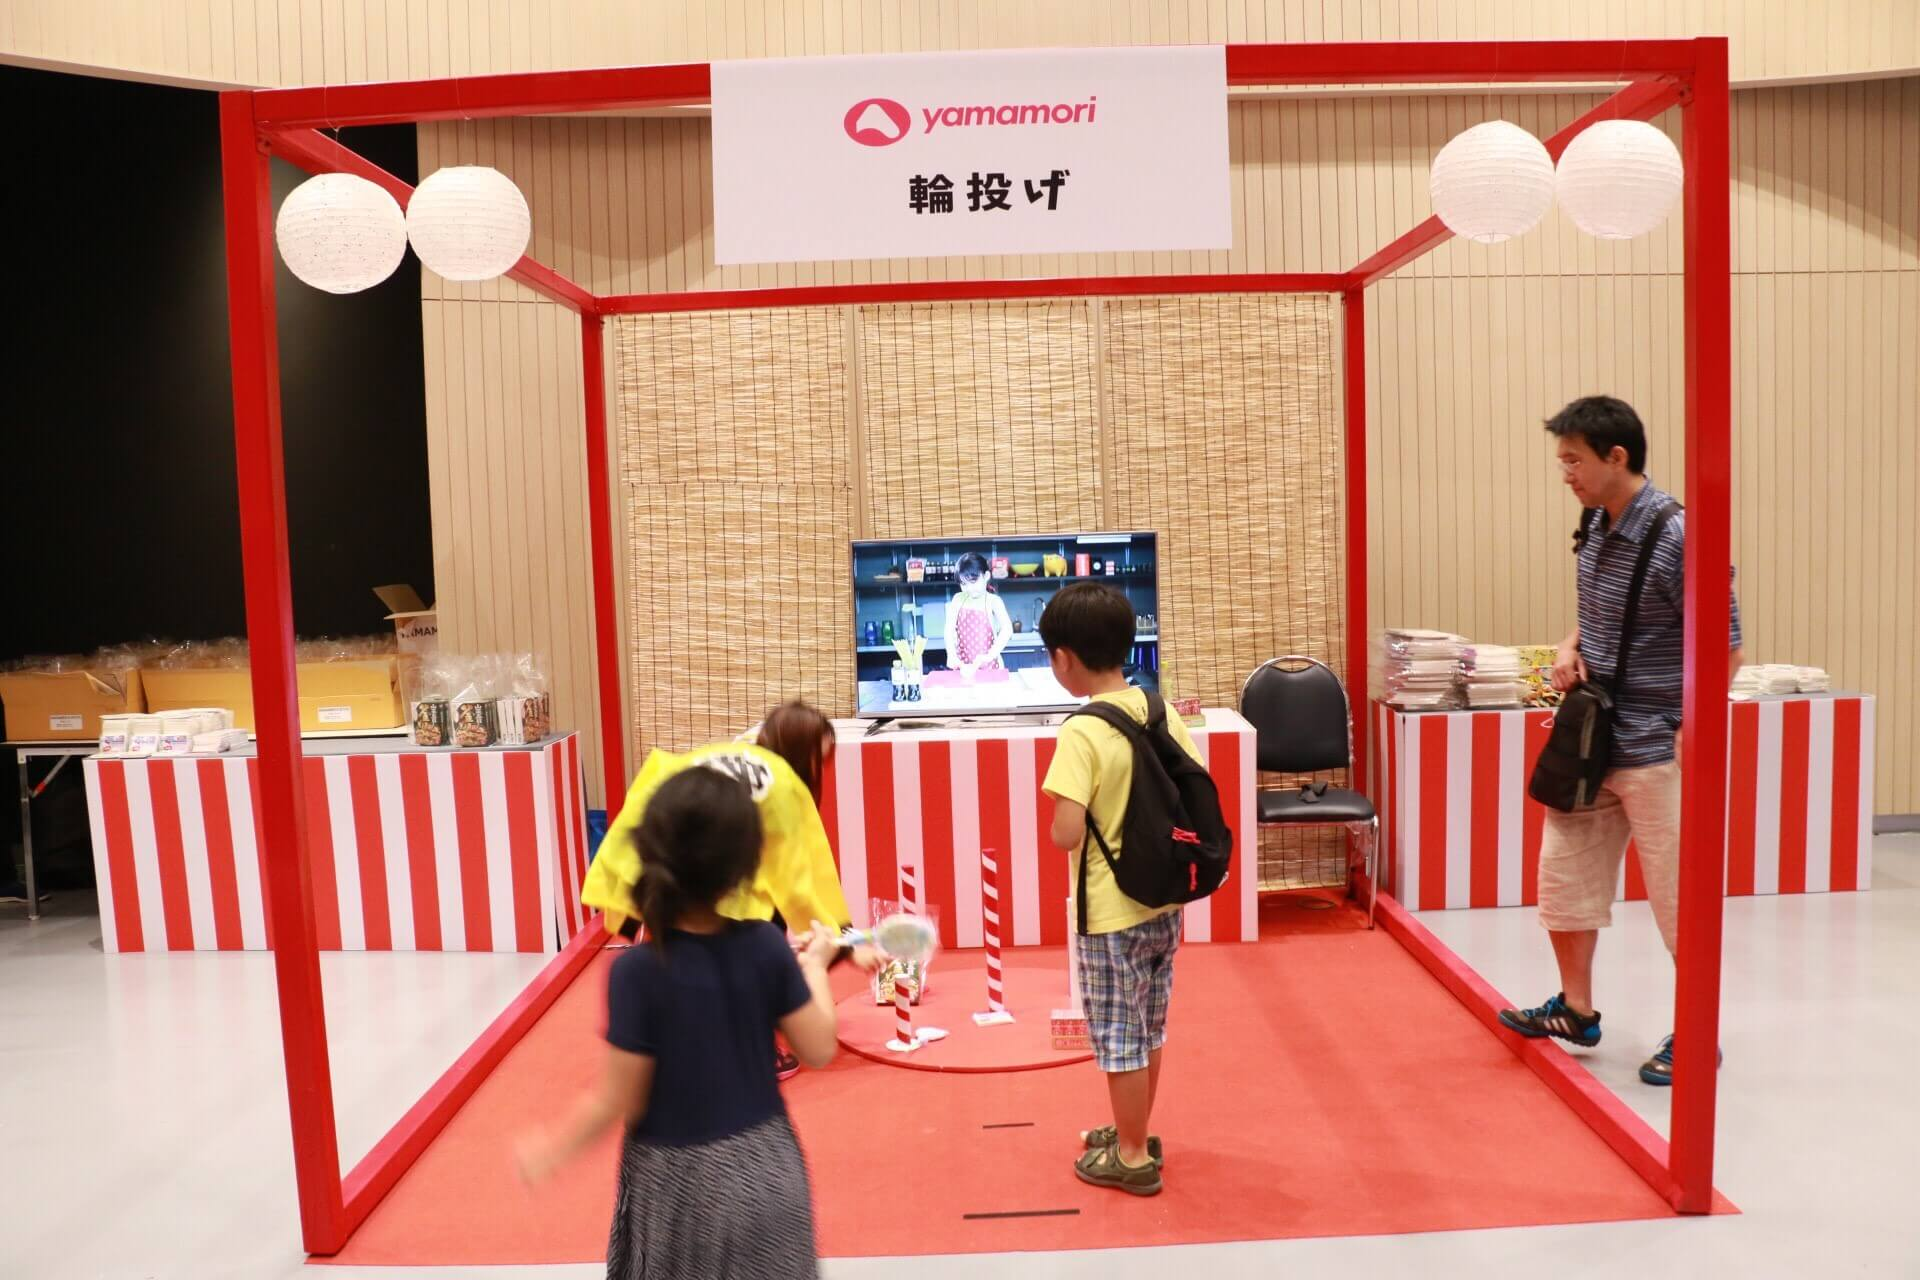 booth yamamori